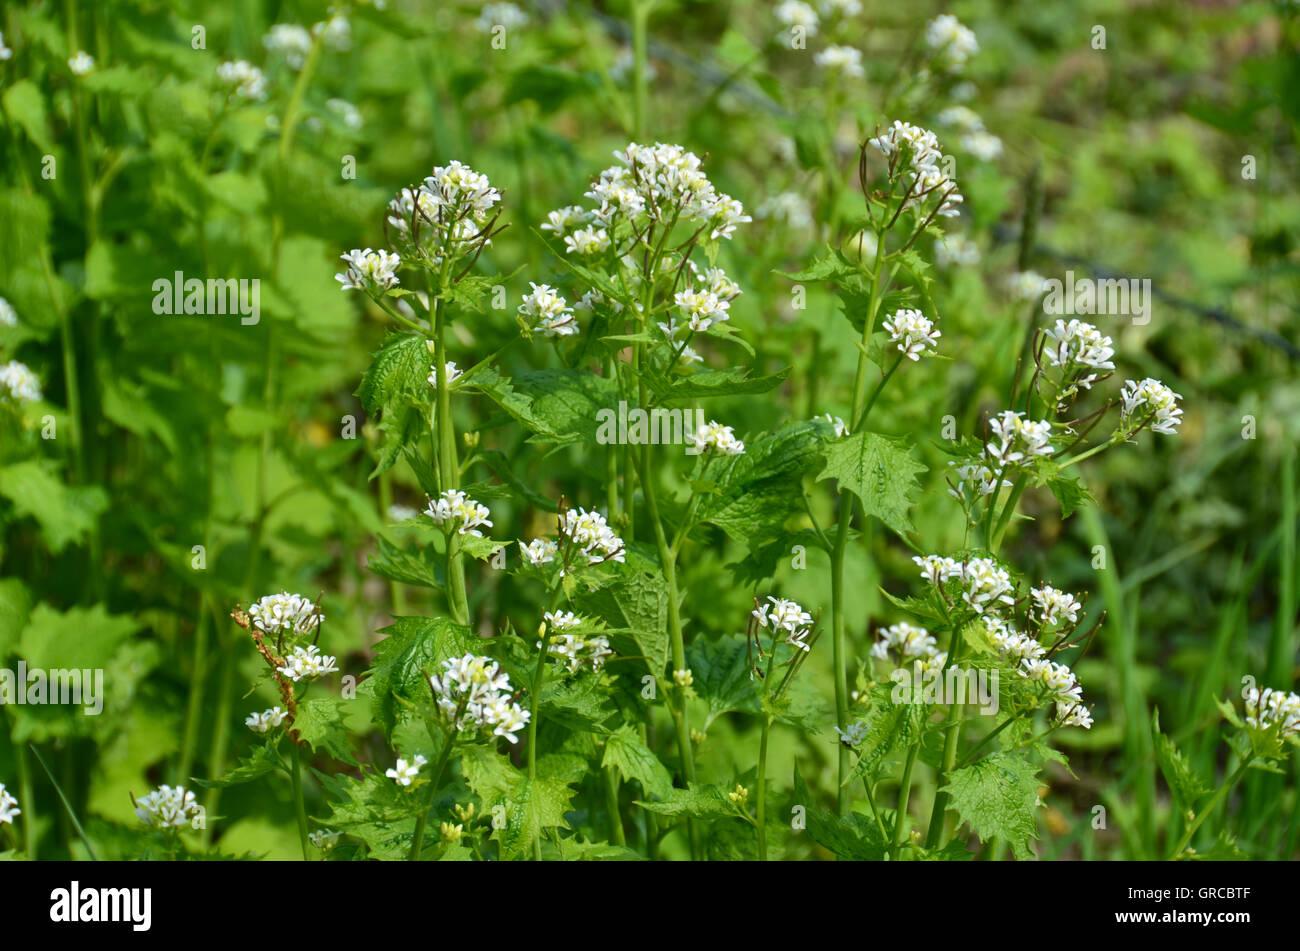 Flowering Garlic Mustard, Alliaria Petiolata, Eatable Herbs Stock Photo